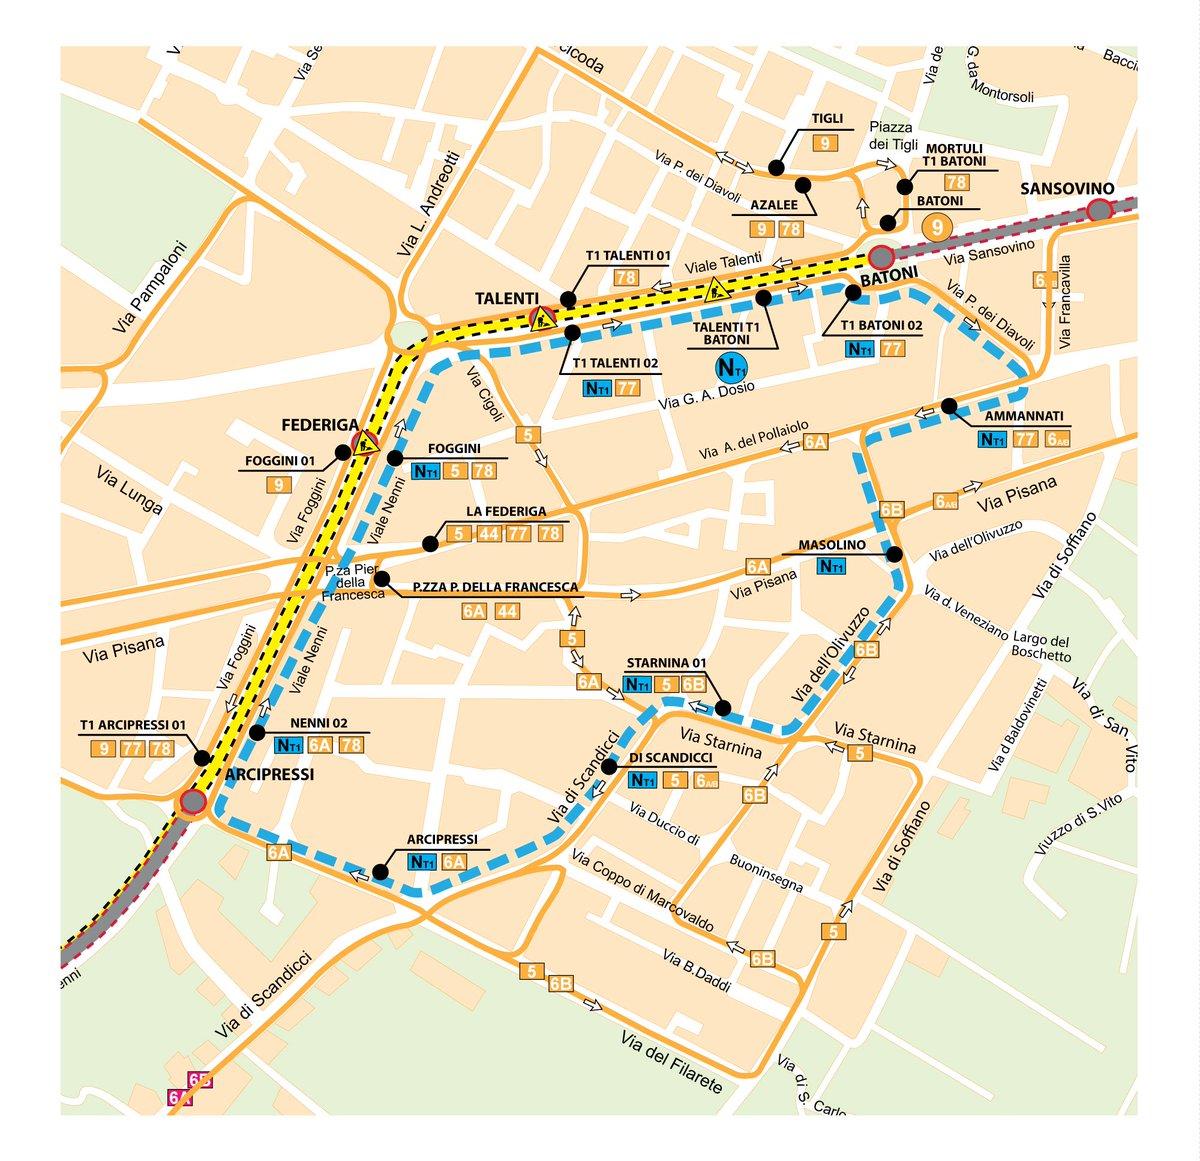 "RT @TramviaGEST: #Murofoggini: Dal 13 giugno tra ARCIPRESSI e BATONI attivati bus sostitutivi: 77, 78, 9 e NT1. La mappa di Ataf... https:/…<a target=""_blank"" href=""https://t.co/6OTiJ7GCxT""><br><b>Vai a Twitter<b></a>"